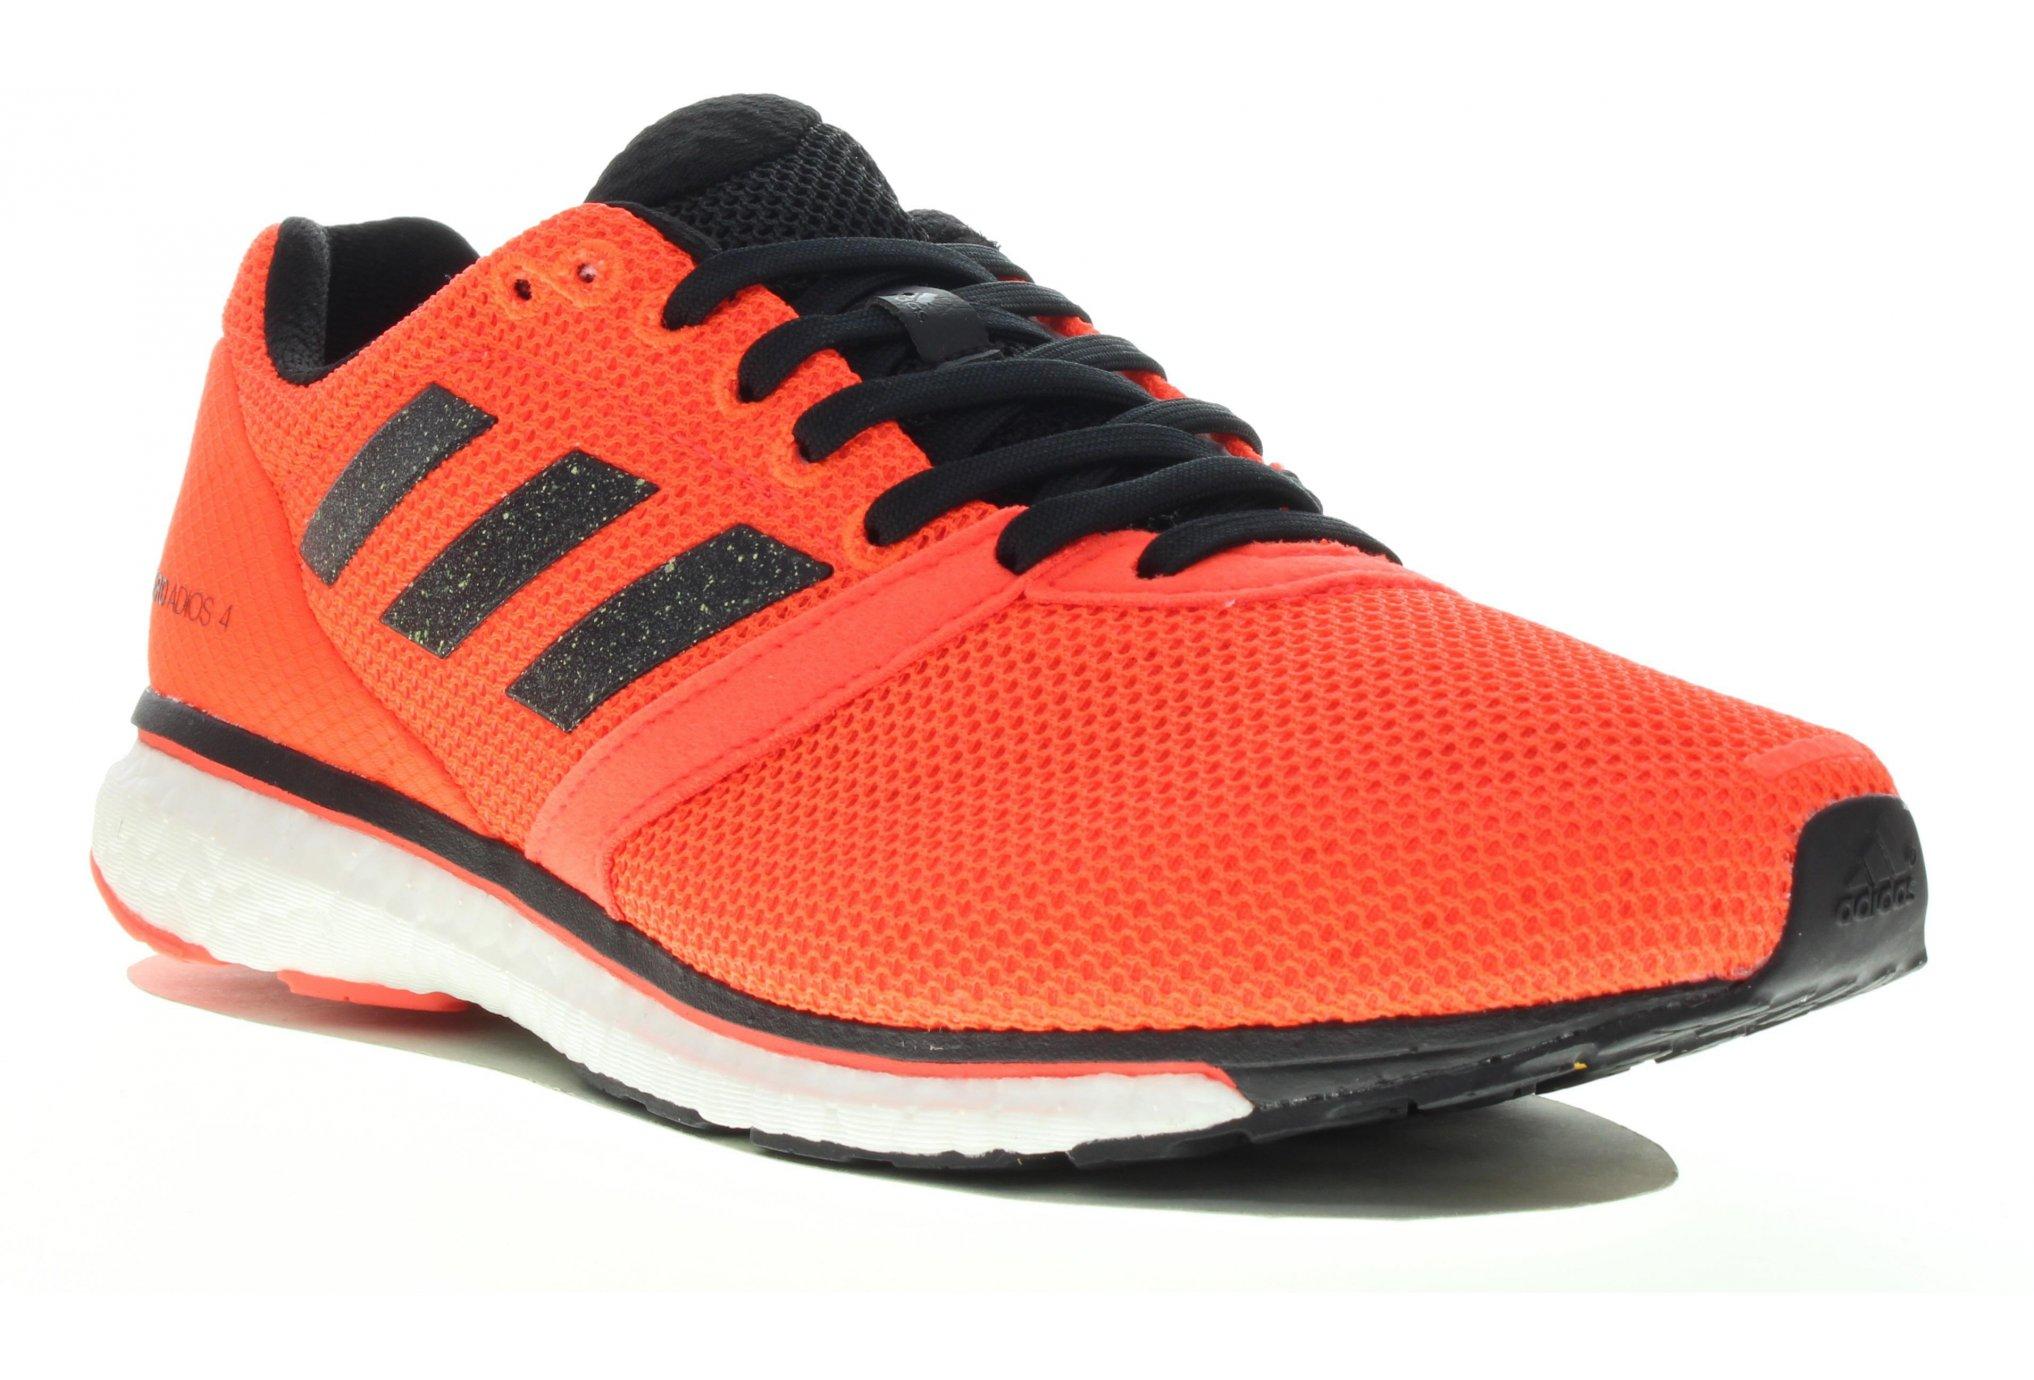 Adidas Adios 0o8nwkp 3 M Boost Adizero TPikXZOu